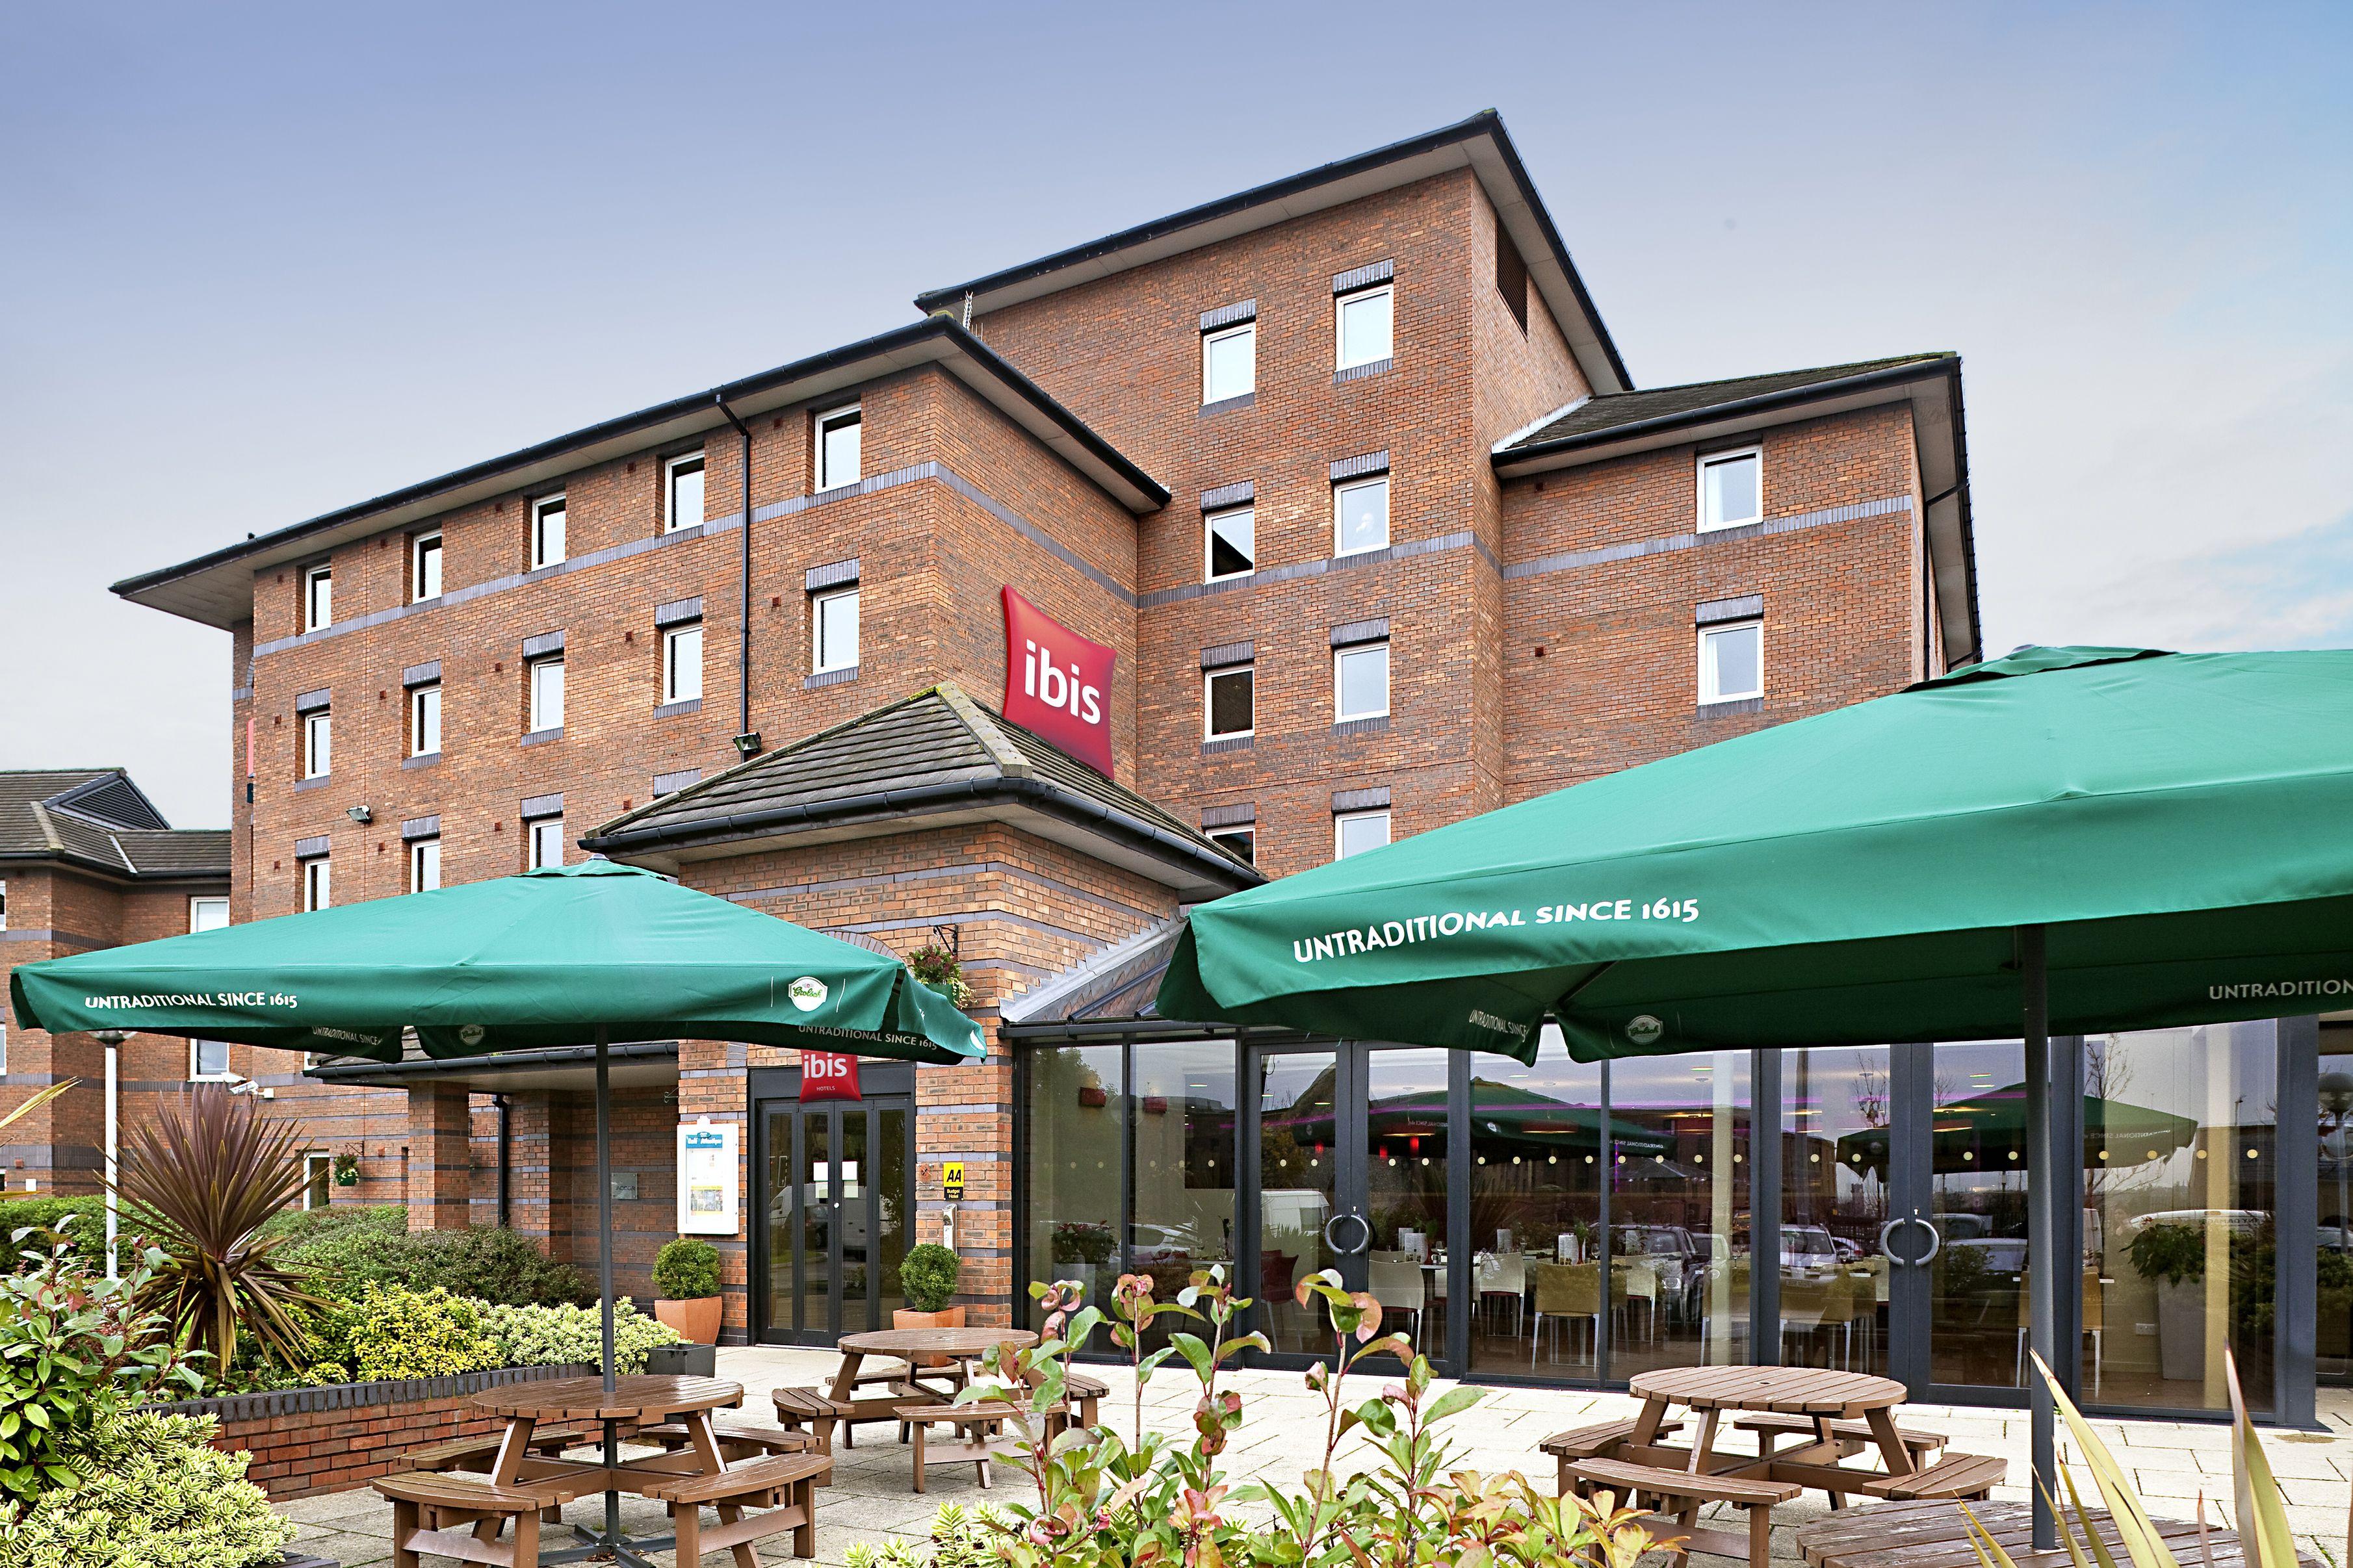 ibis Liverpool Centre Albert Dock - Liverpool One Hotel